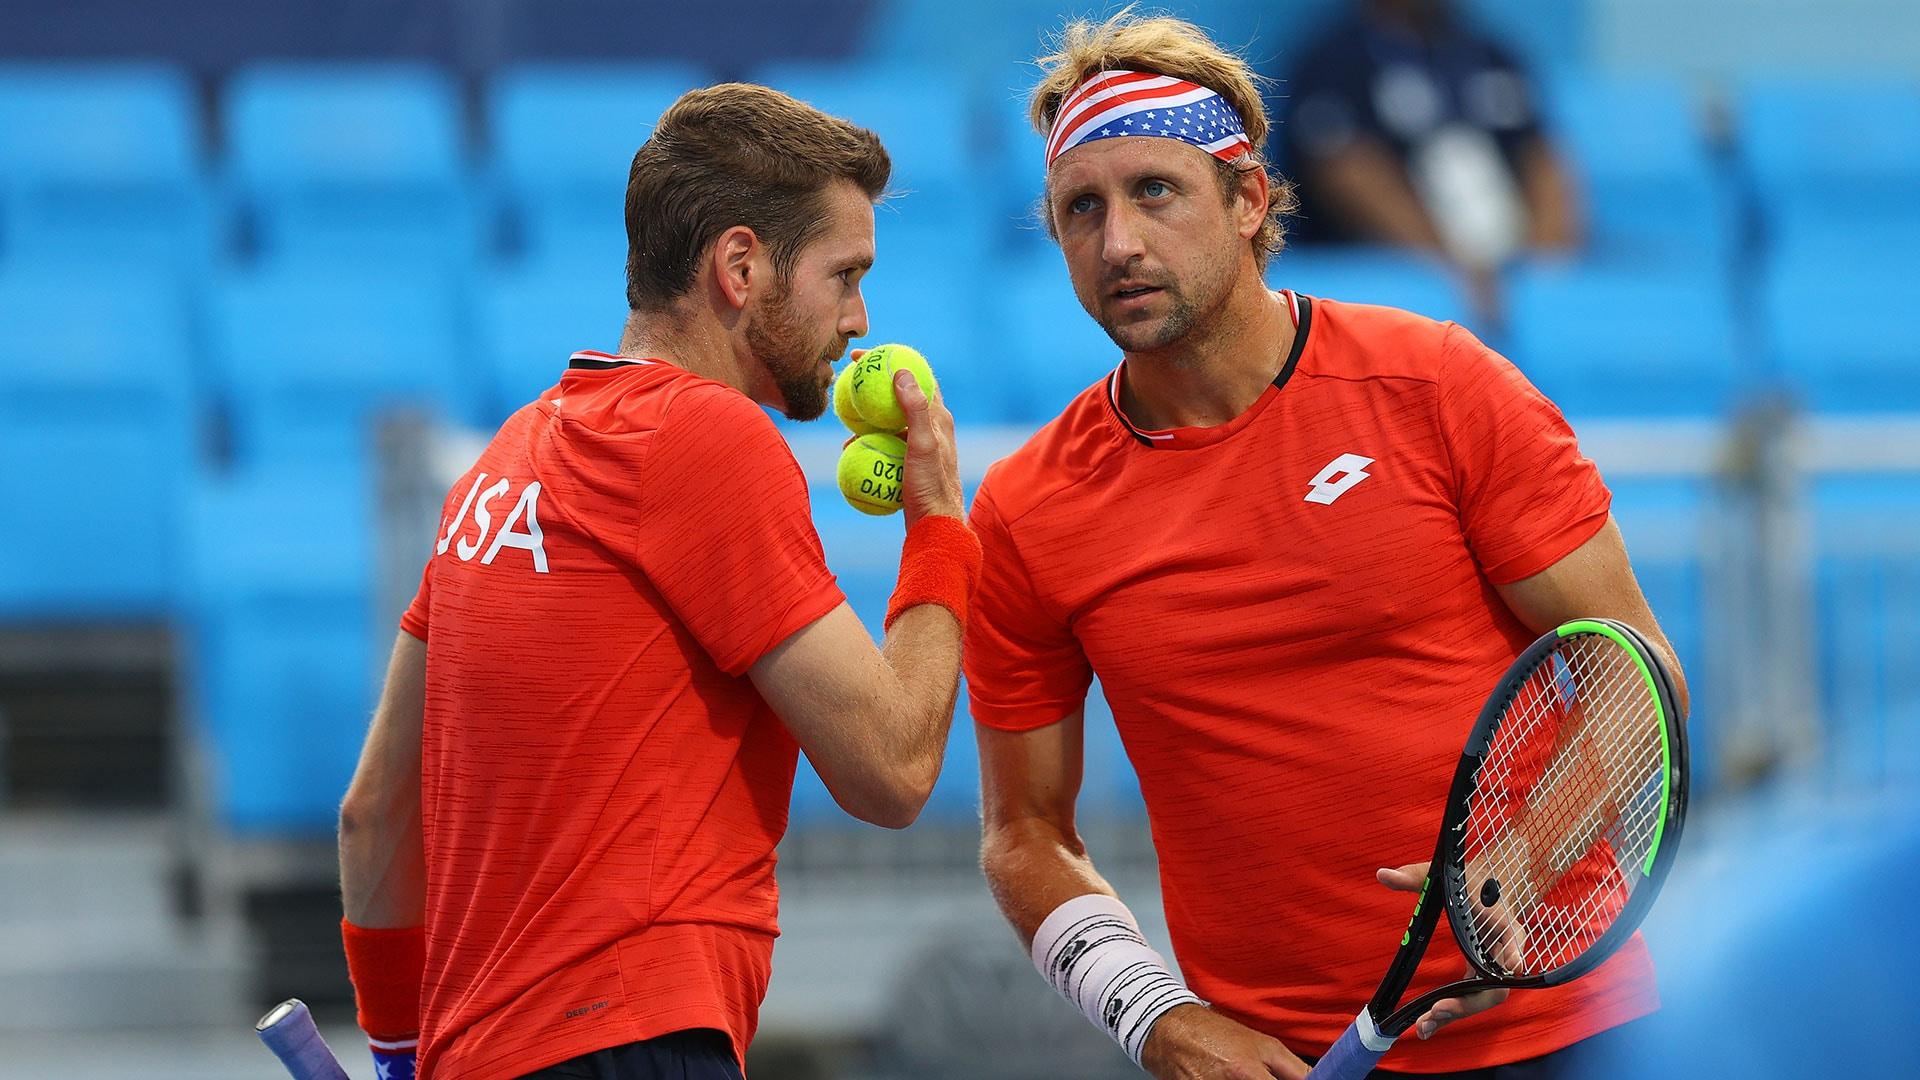 Image for Krajicek and Sandgren, last hope for U.S. in tennis, fall in bronze medal match